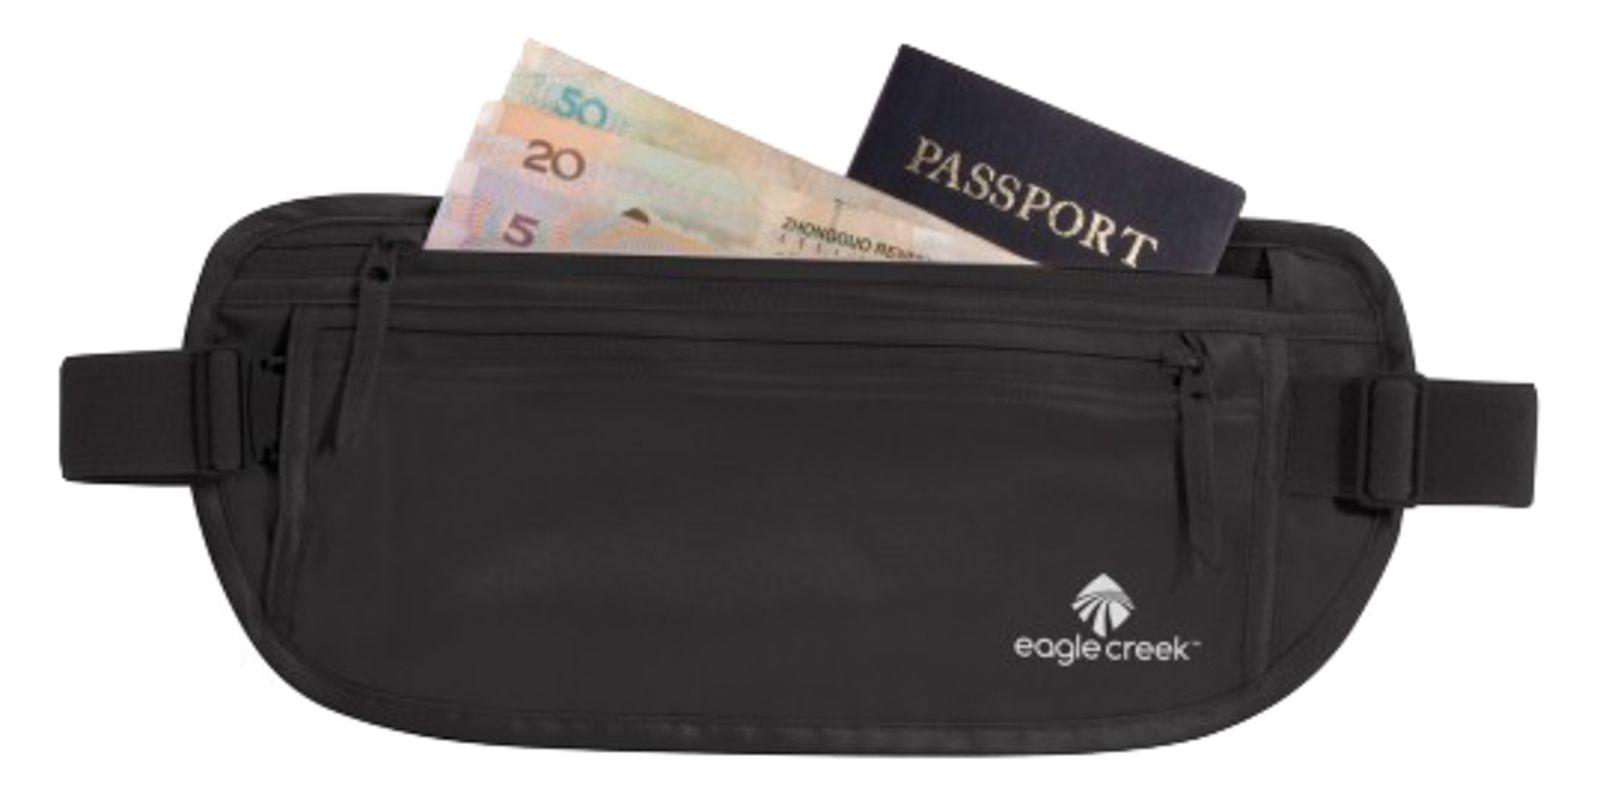 eagle creek Security Silk Undercover Money Belt Black